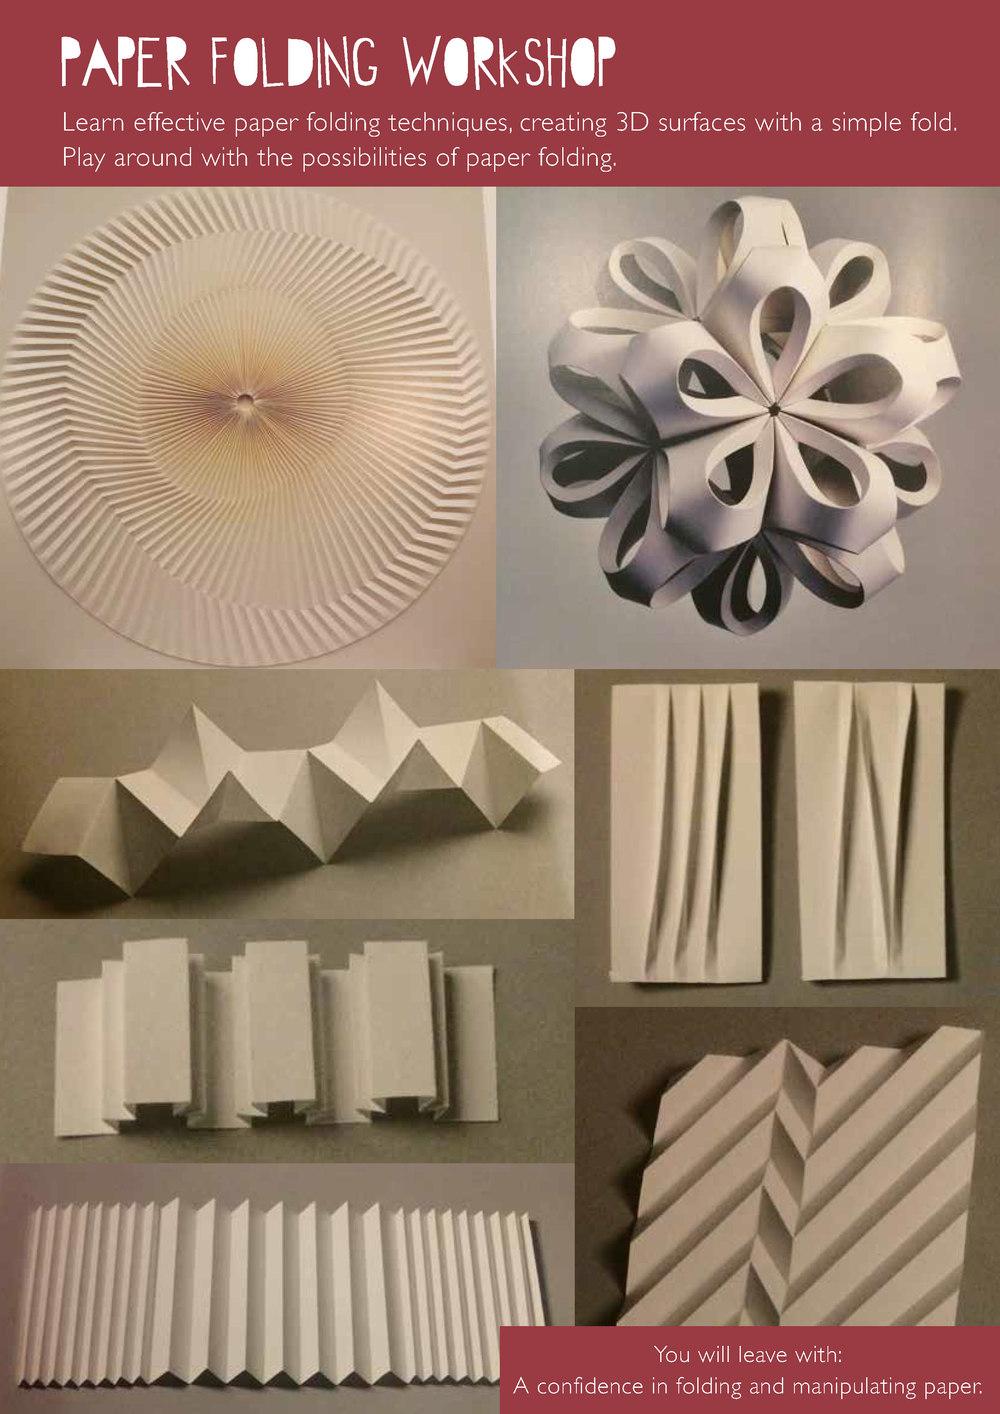 PaperFolding2.jpg